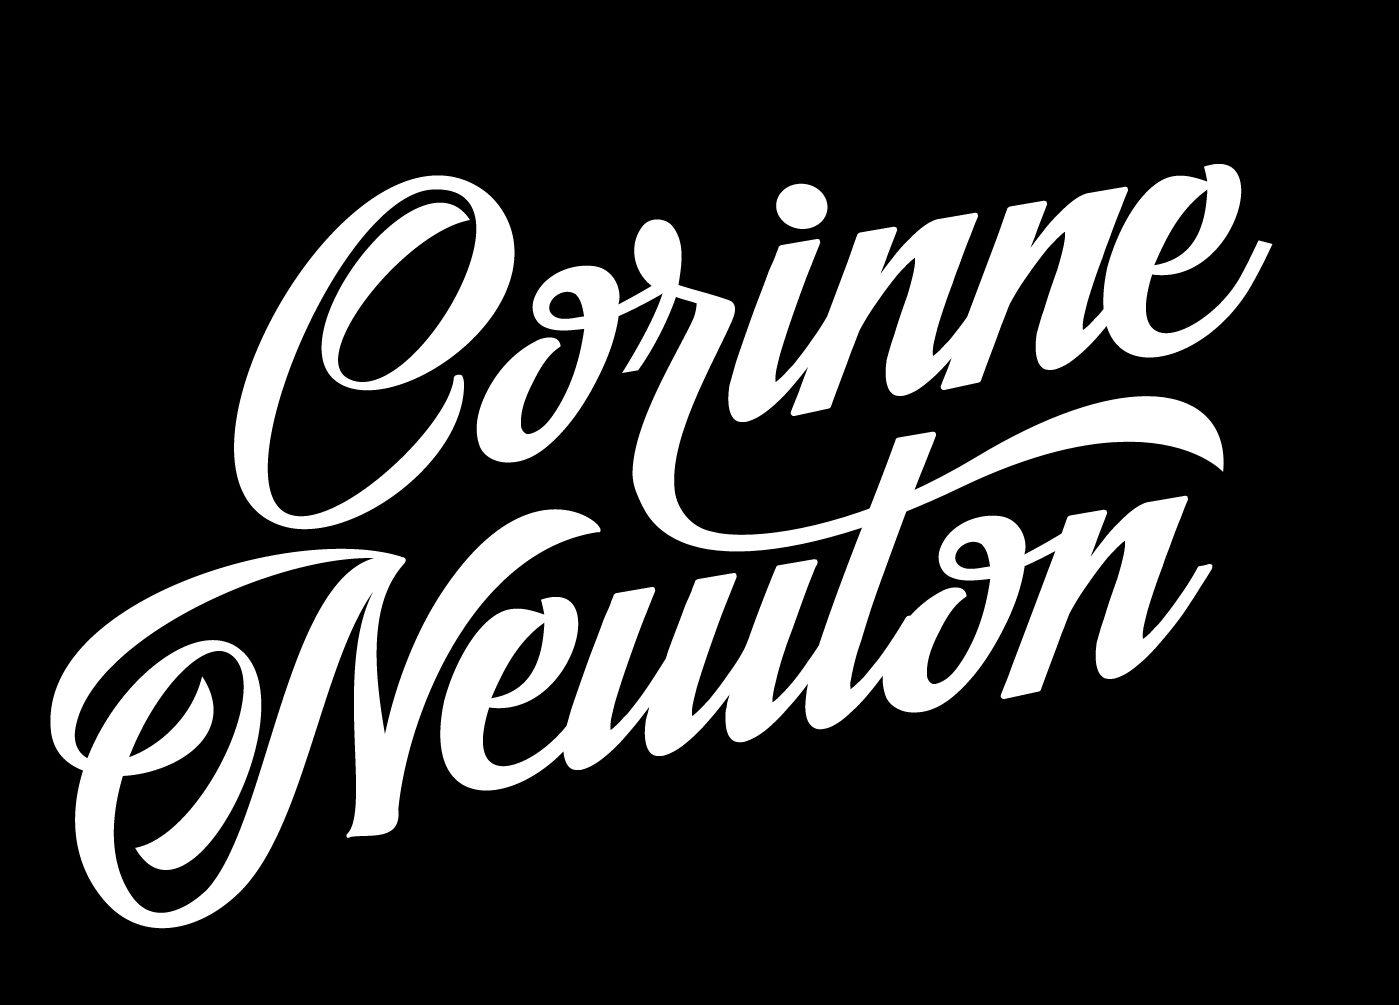 Corinne Newton